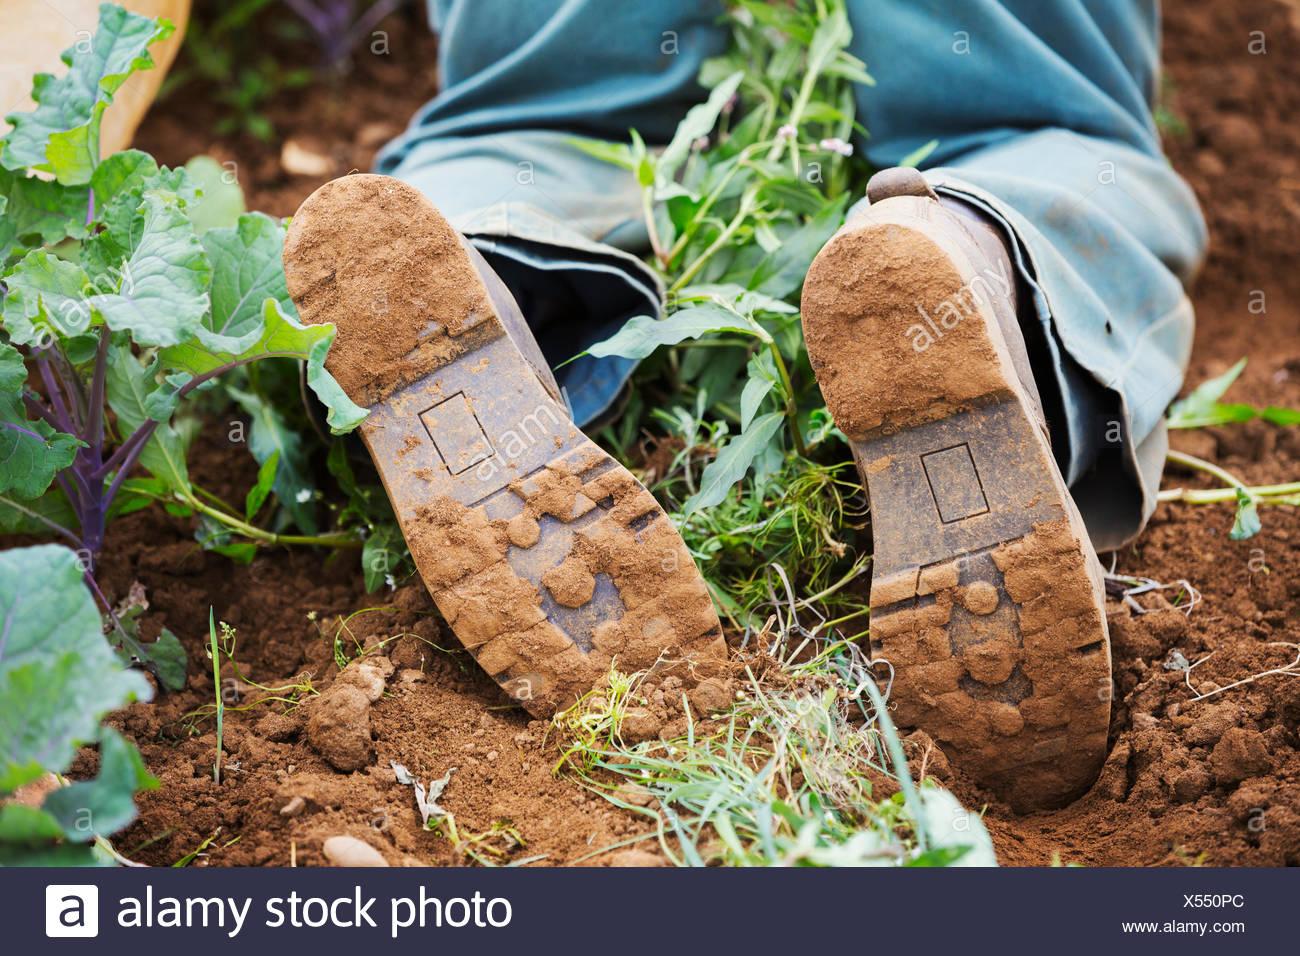 Man in boots kneeling in soil. - Stock Image